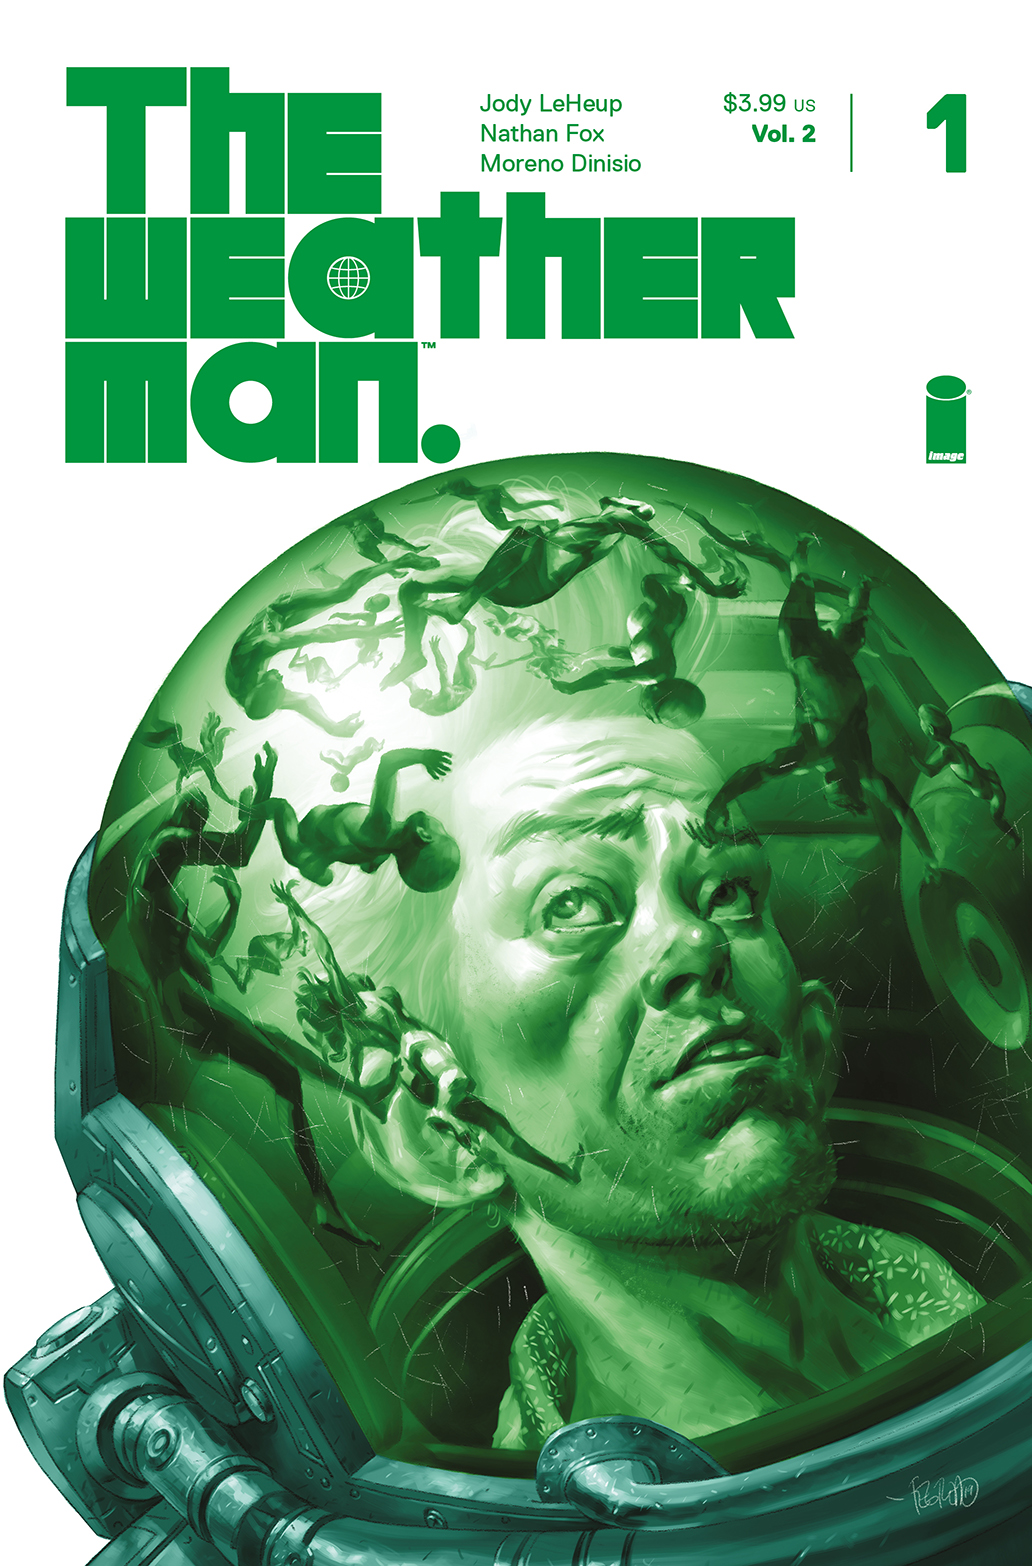 The Weatherman, Vol. 2 #1 variant by Duncan Fegredo